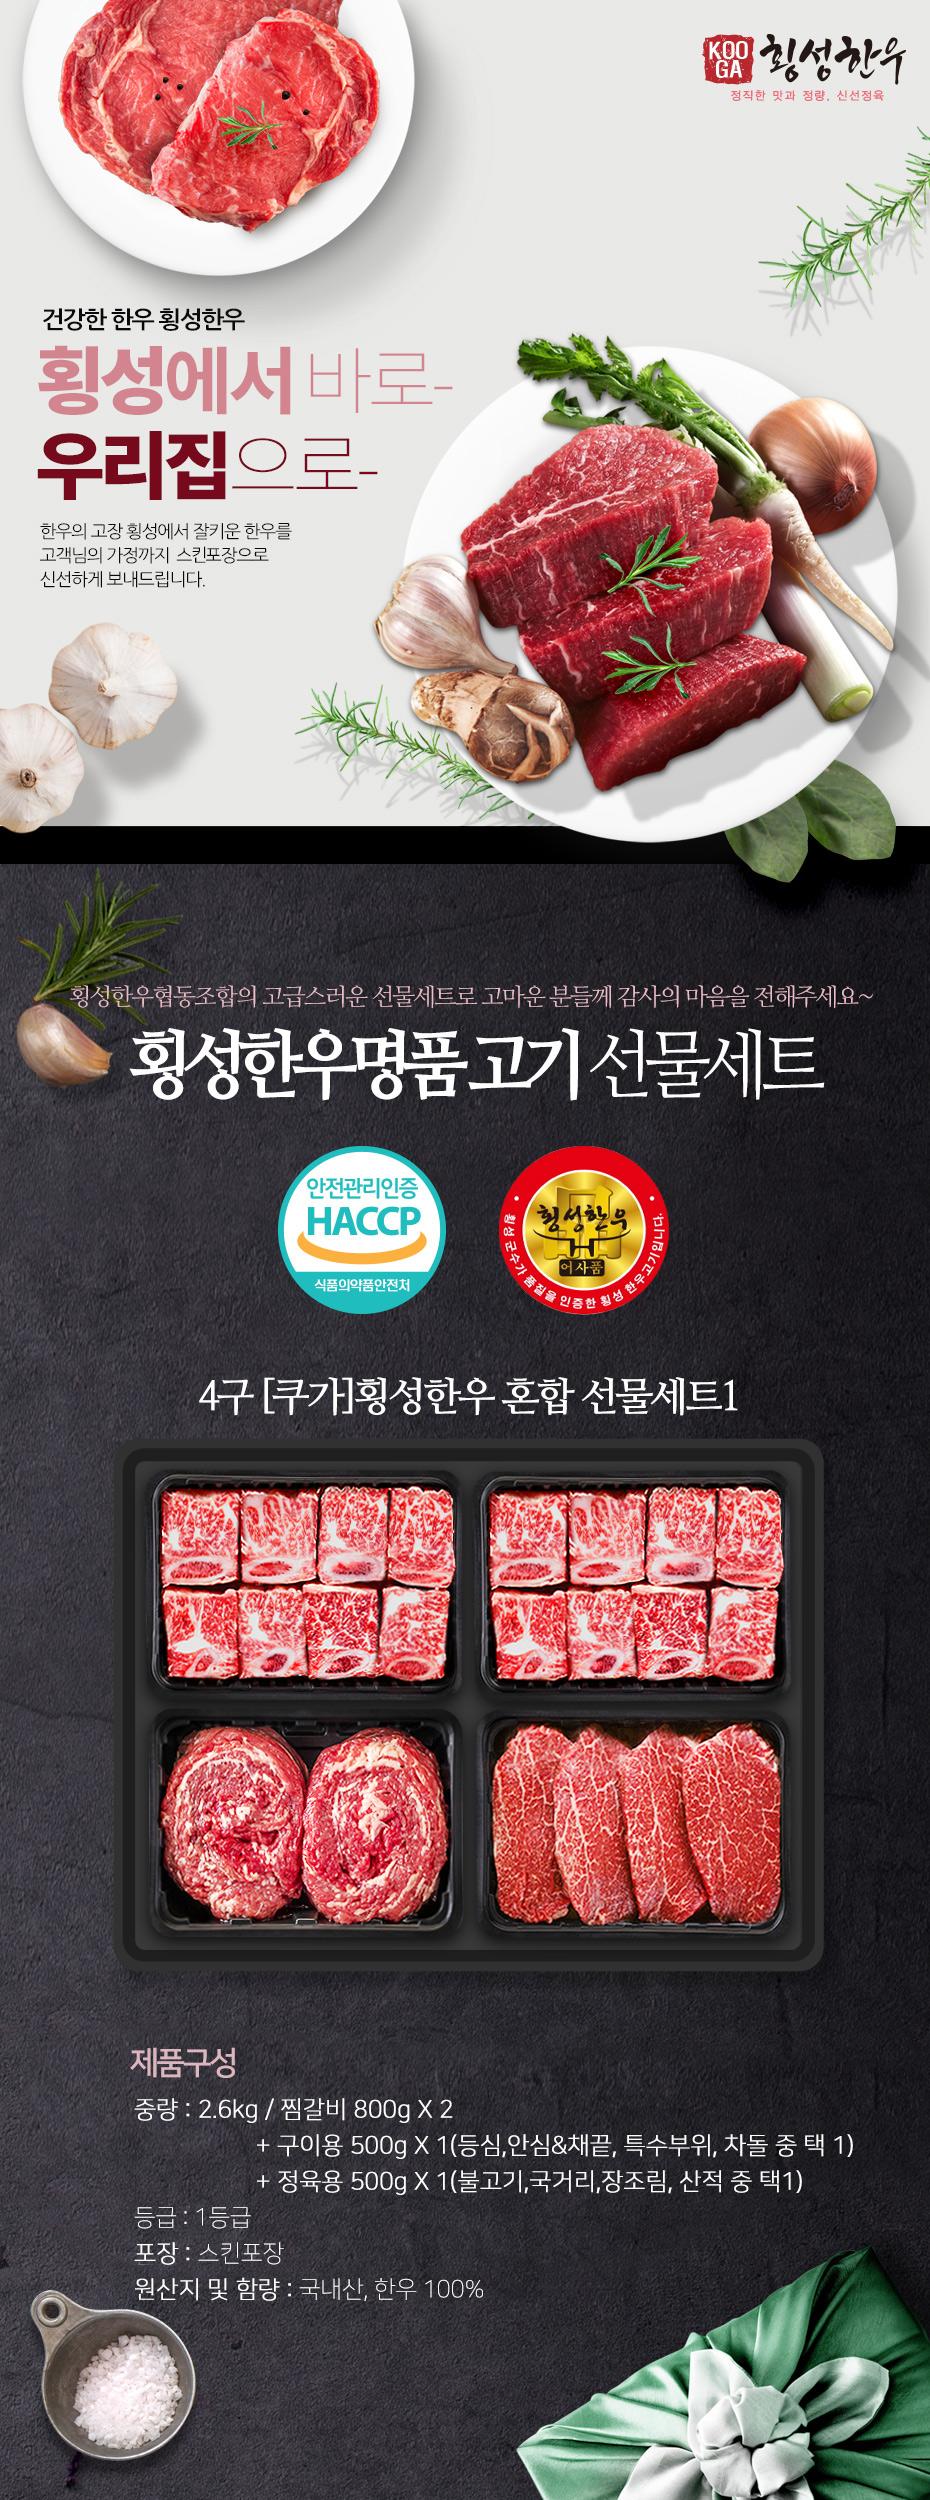 set4_meat_rib2_s_ten_004259.jpg